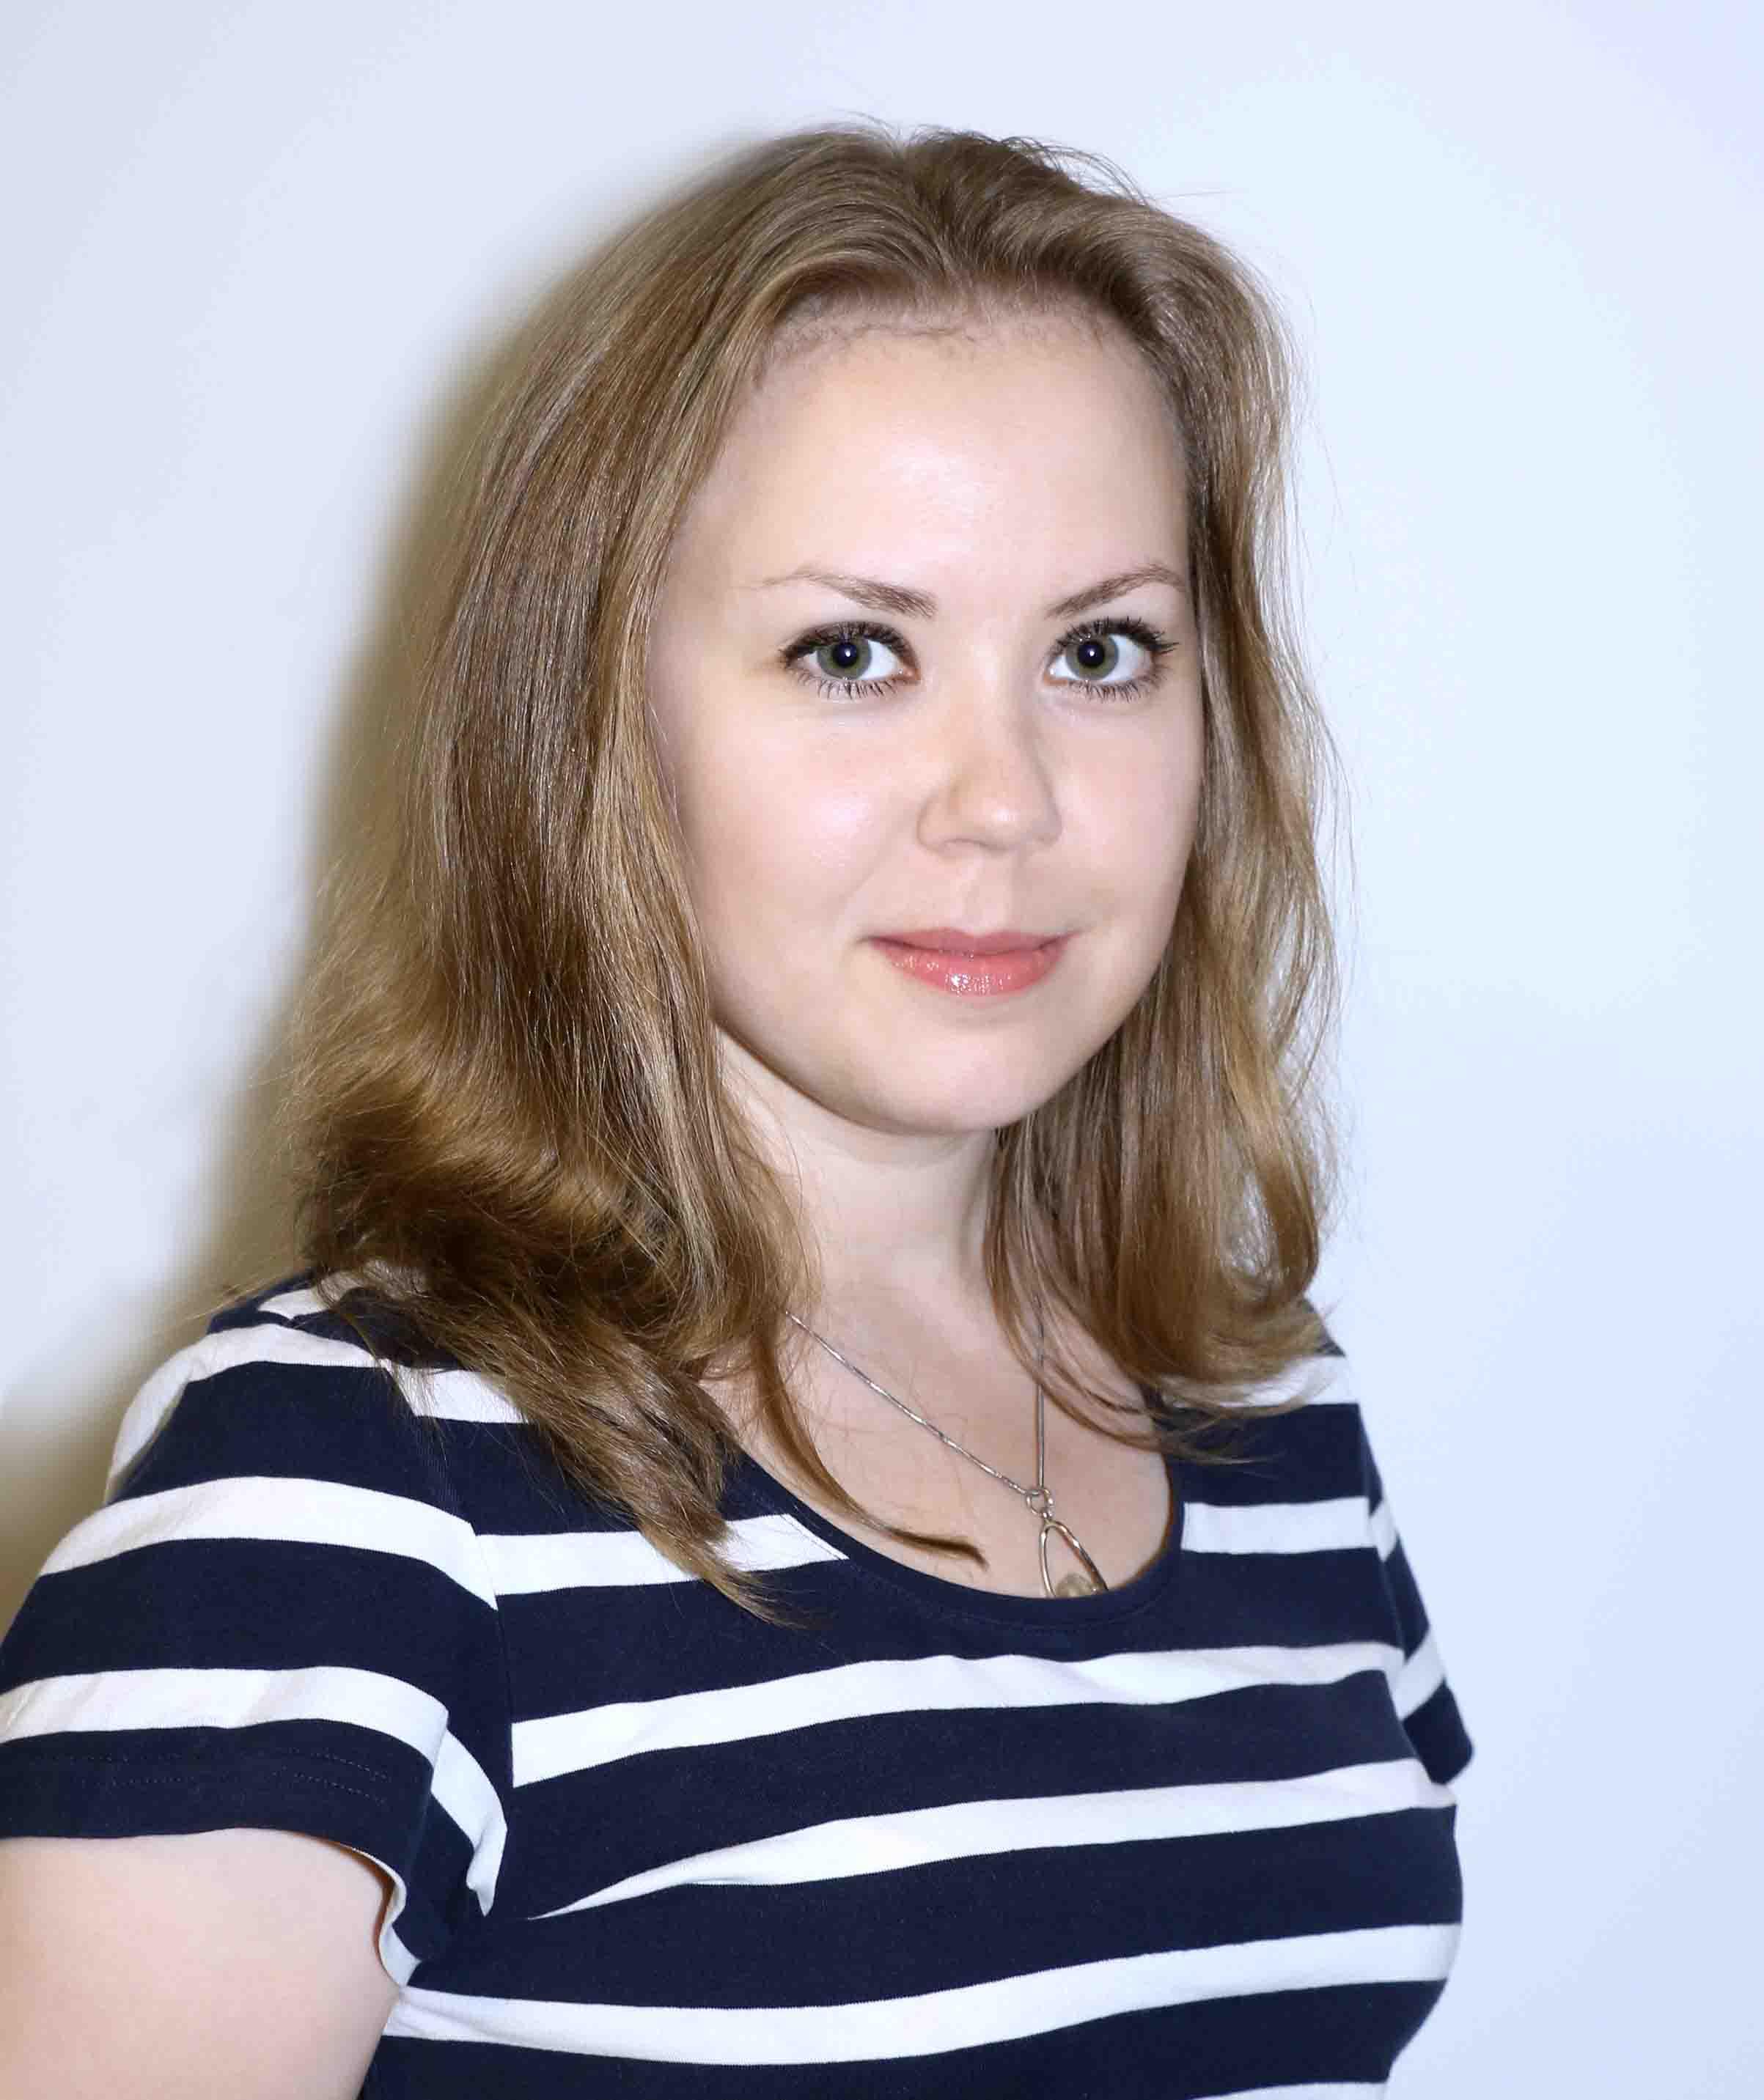 Irina_kadrets_SMALL